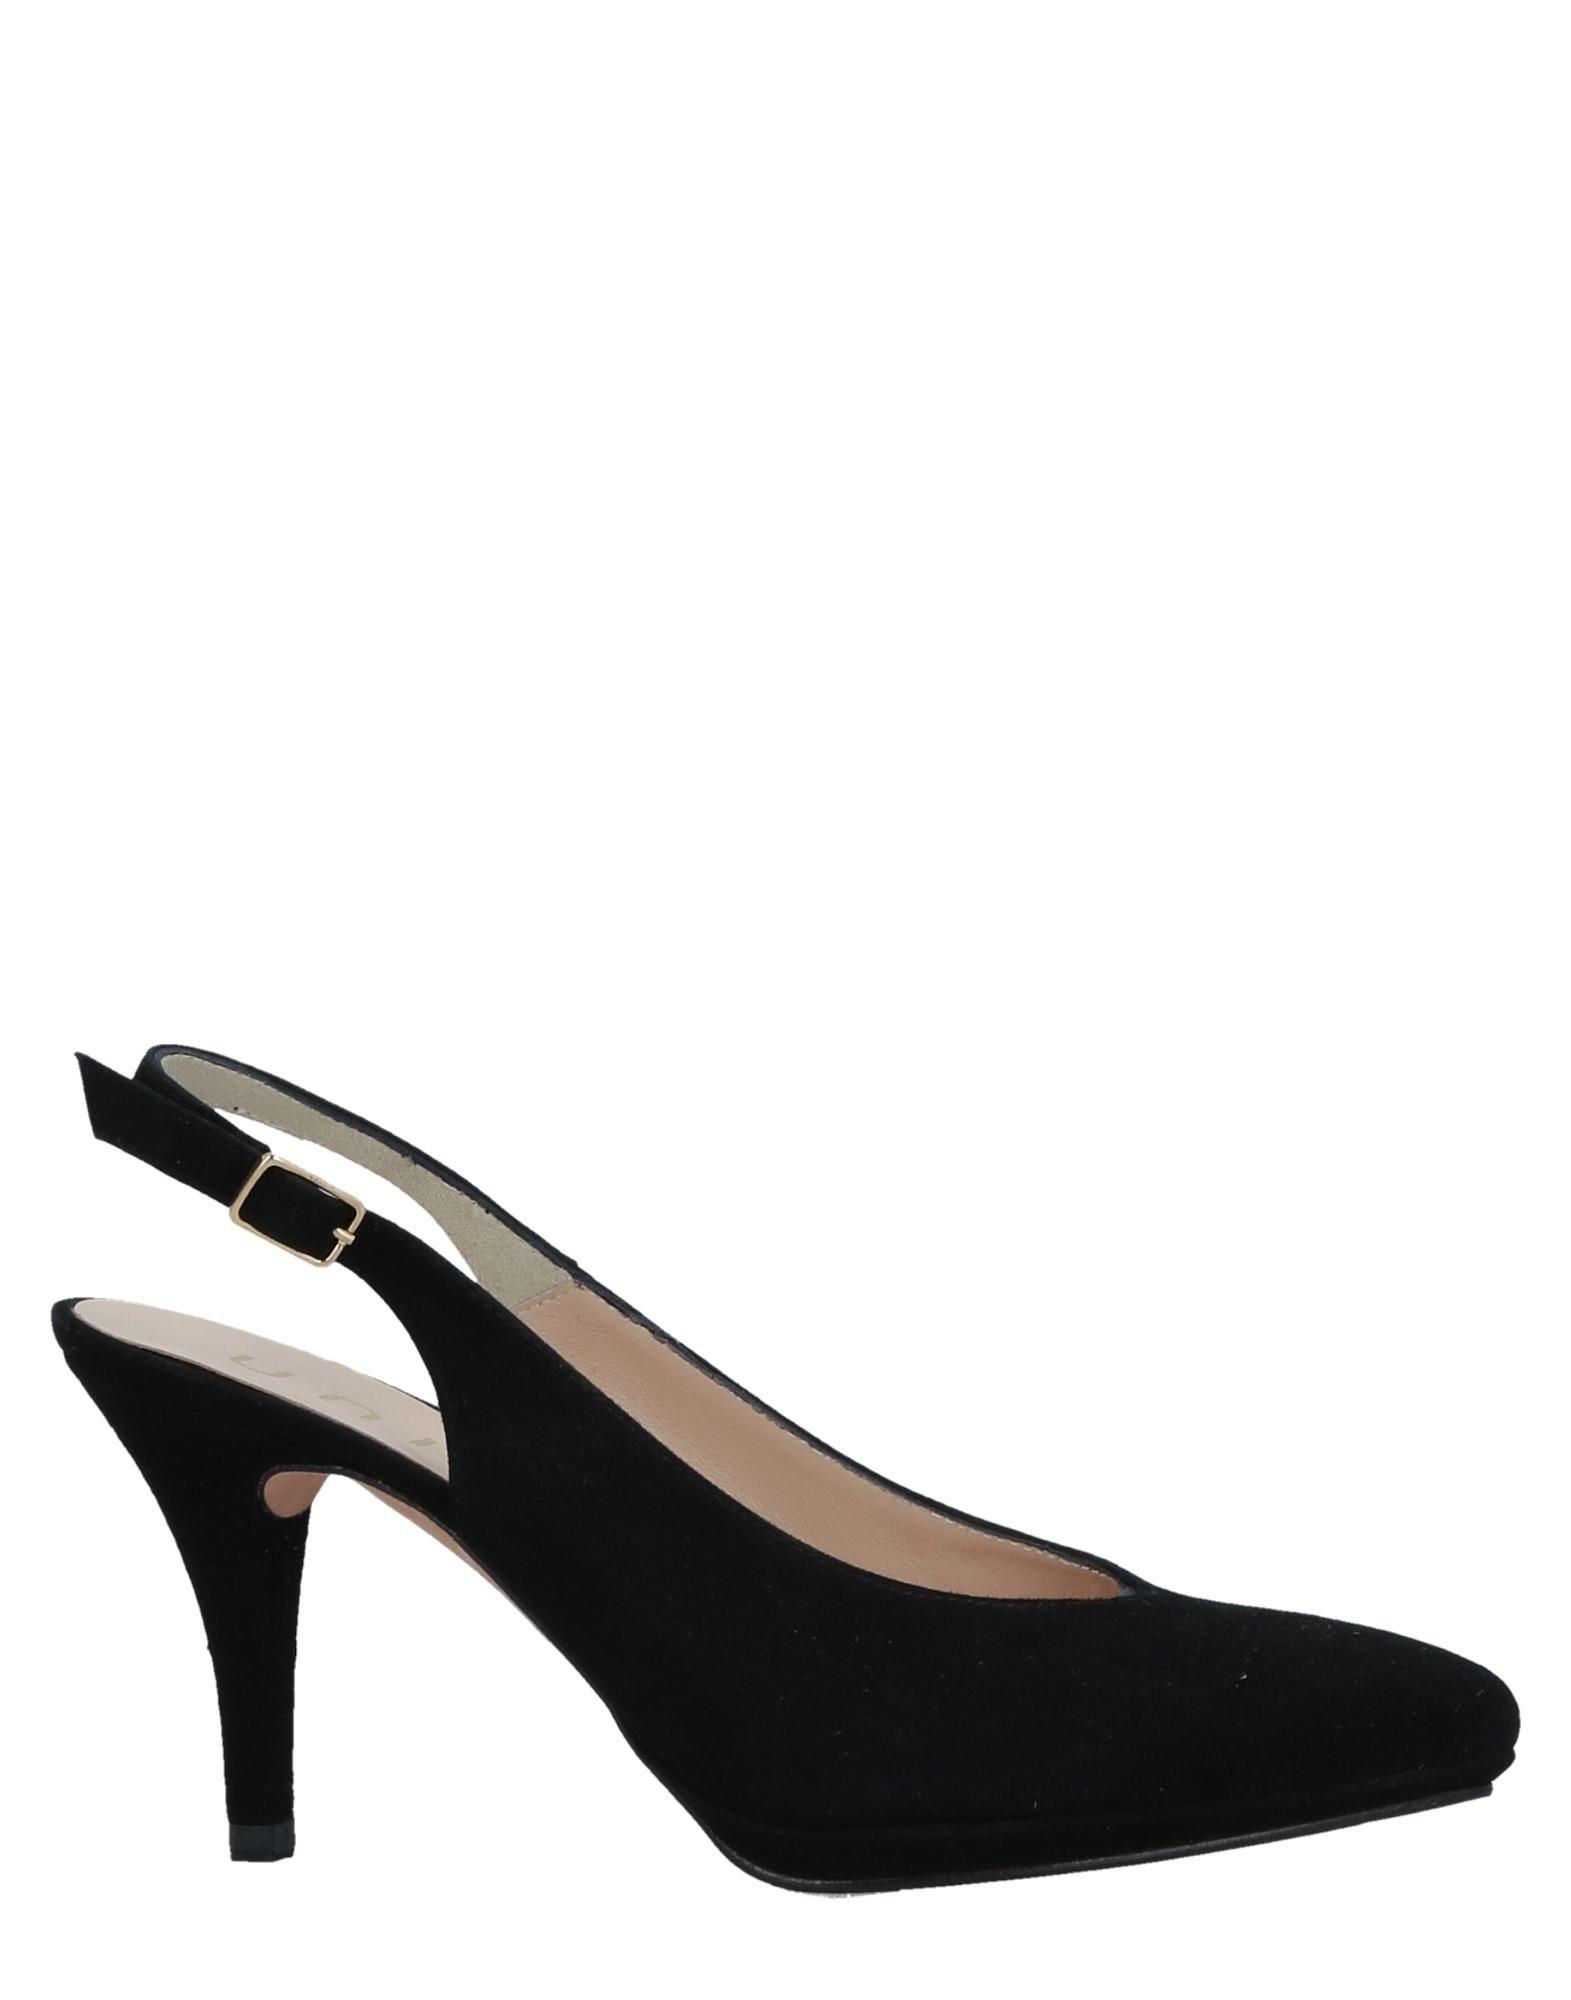 Unisa Pumps Damen  11516684JT Gute Qualität beliebte Schuhe